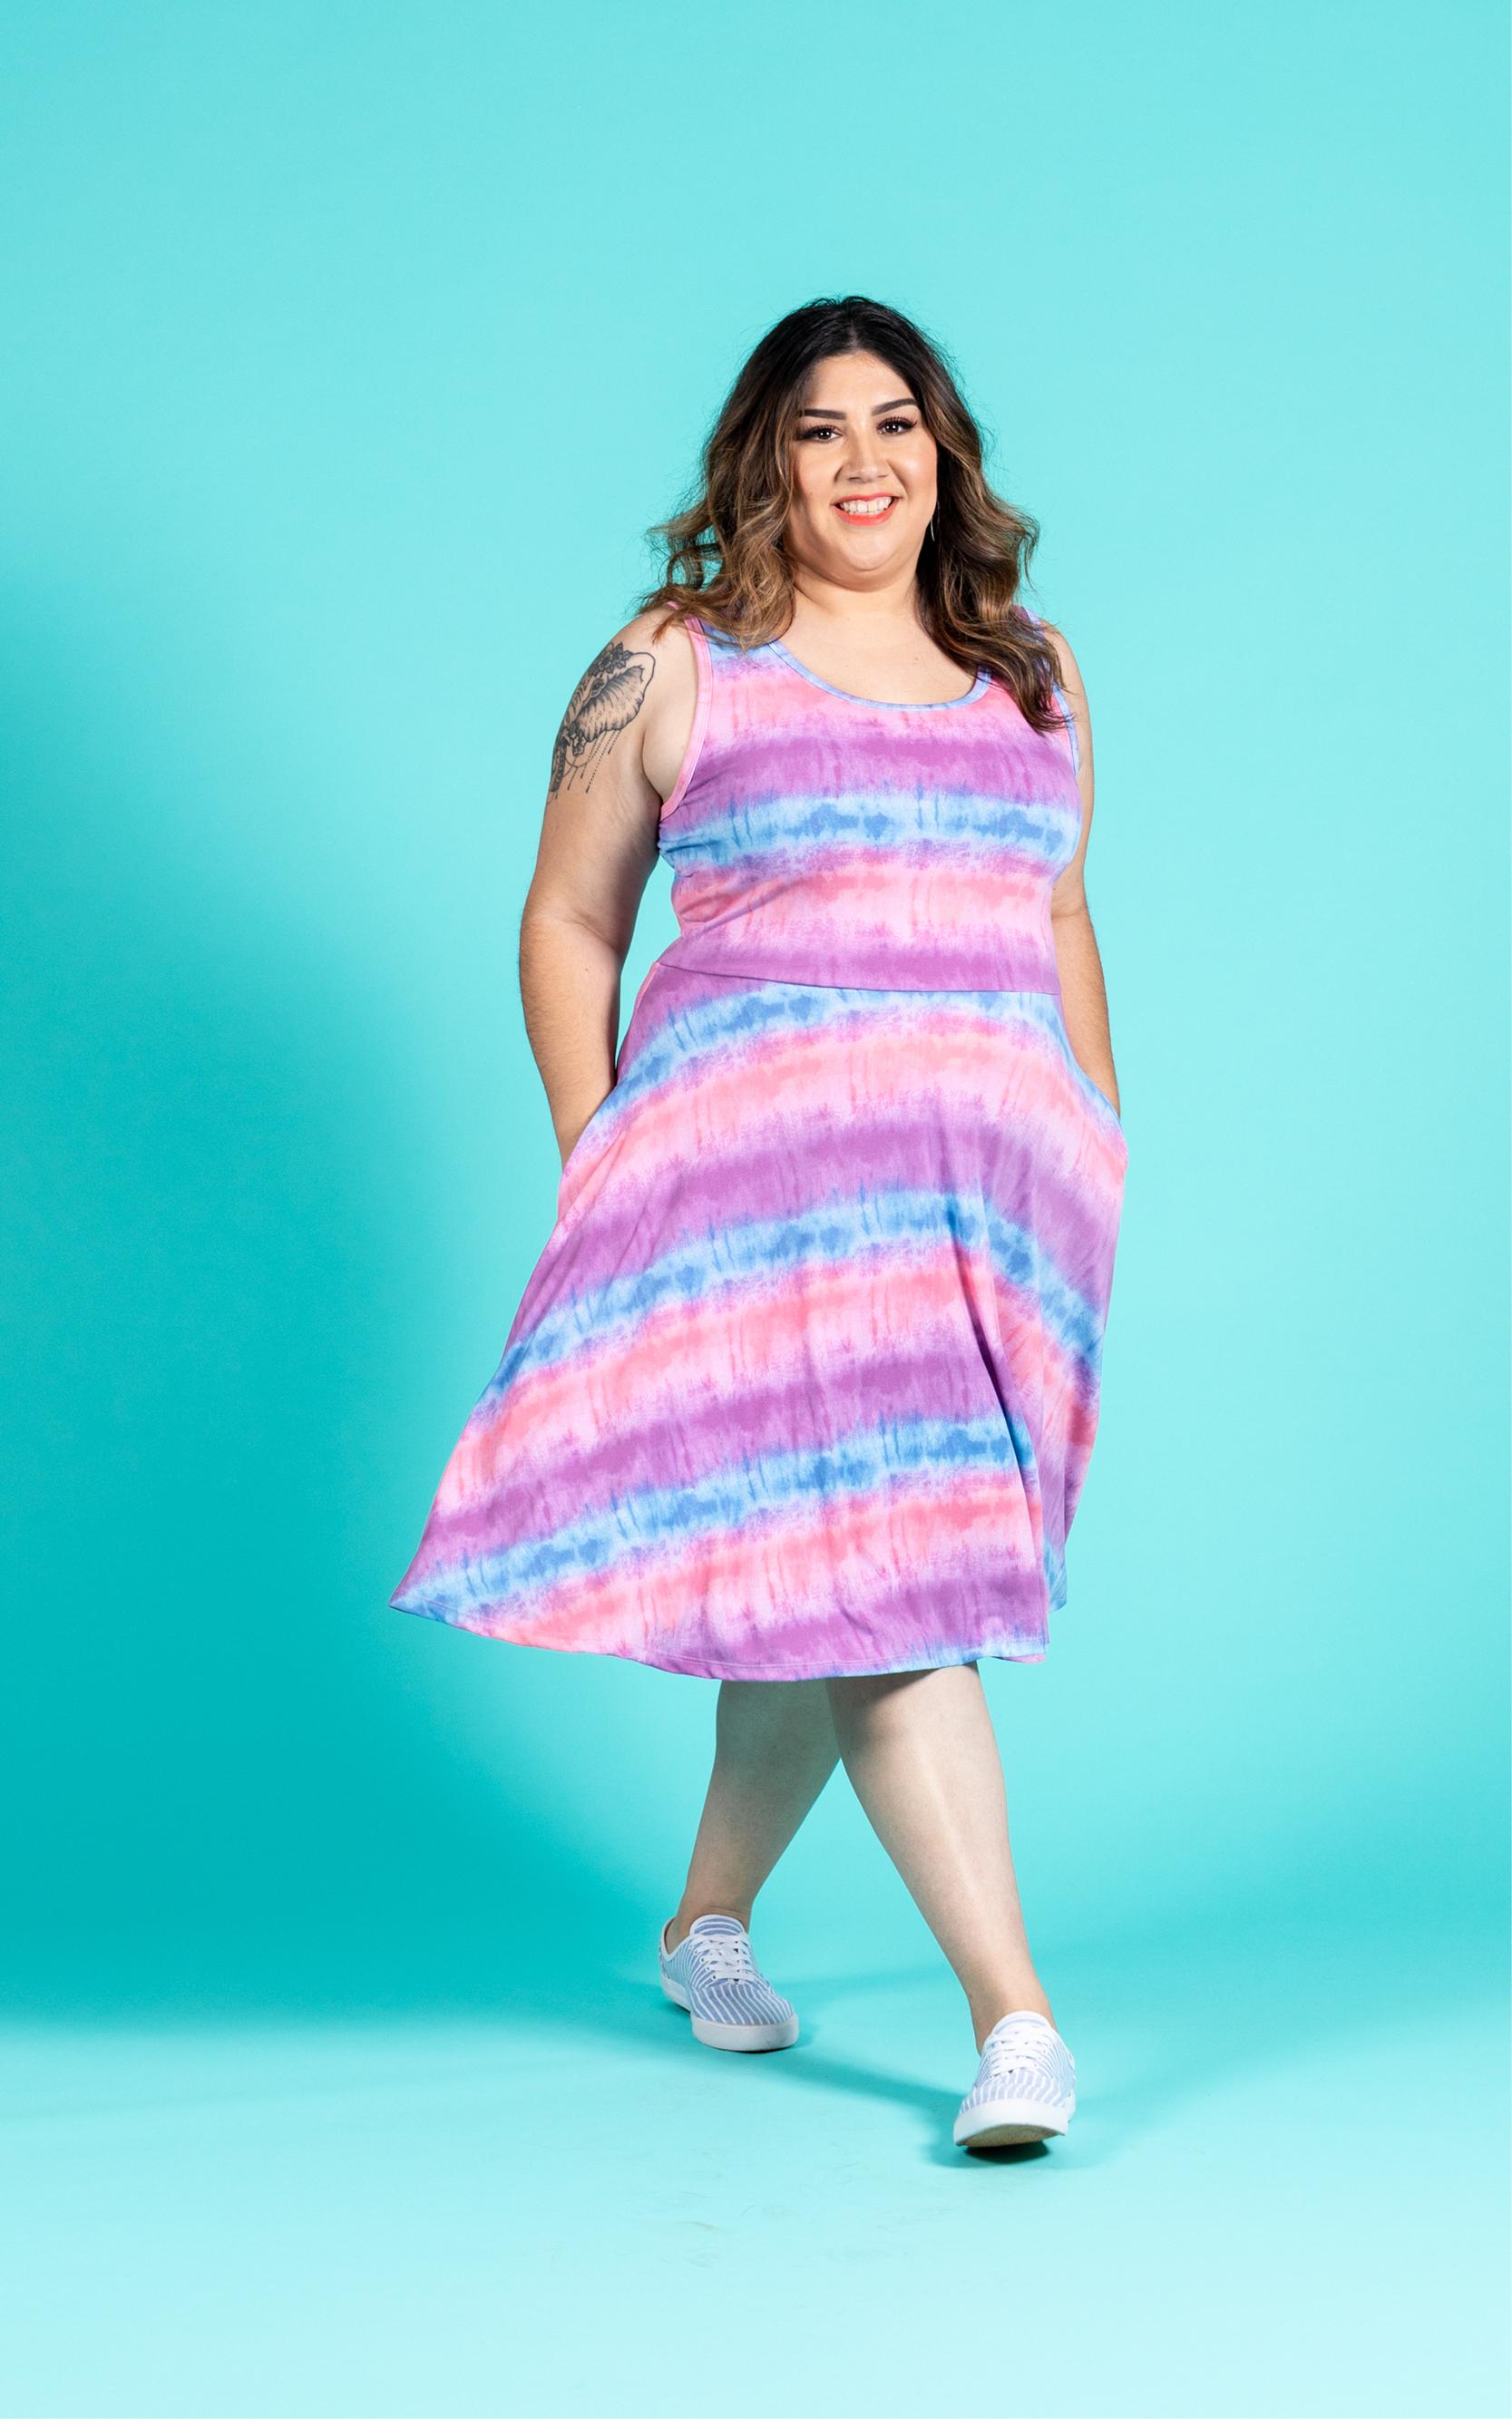 Lularoe Nicki Sizing : lularoe, nicki, sizing, Nicki, Sleeveless, A-Line, Dress, Women's, Collection, LuLaRoe